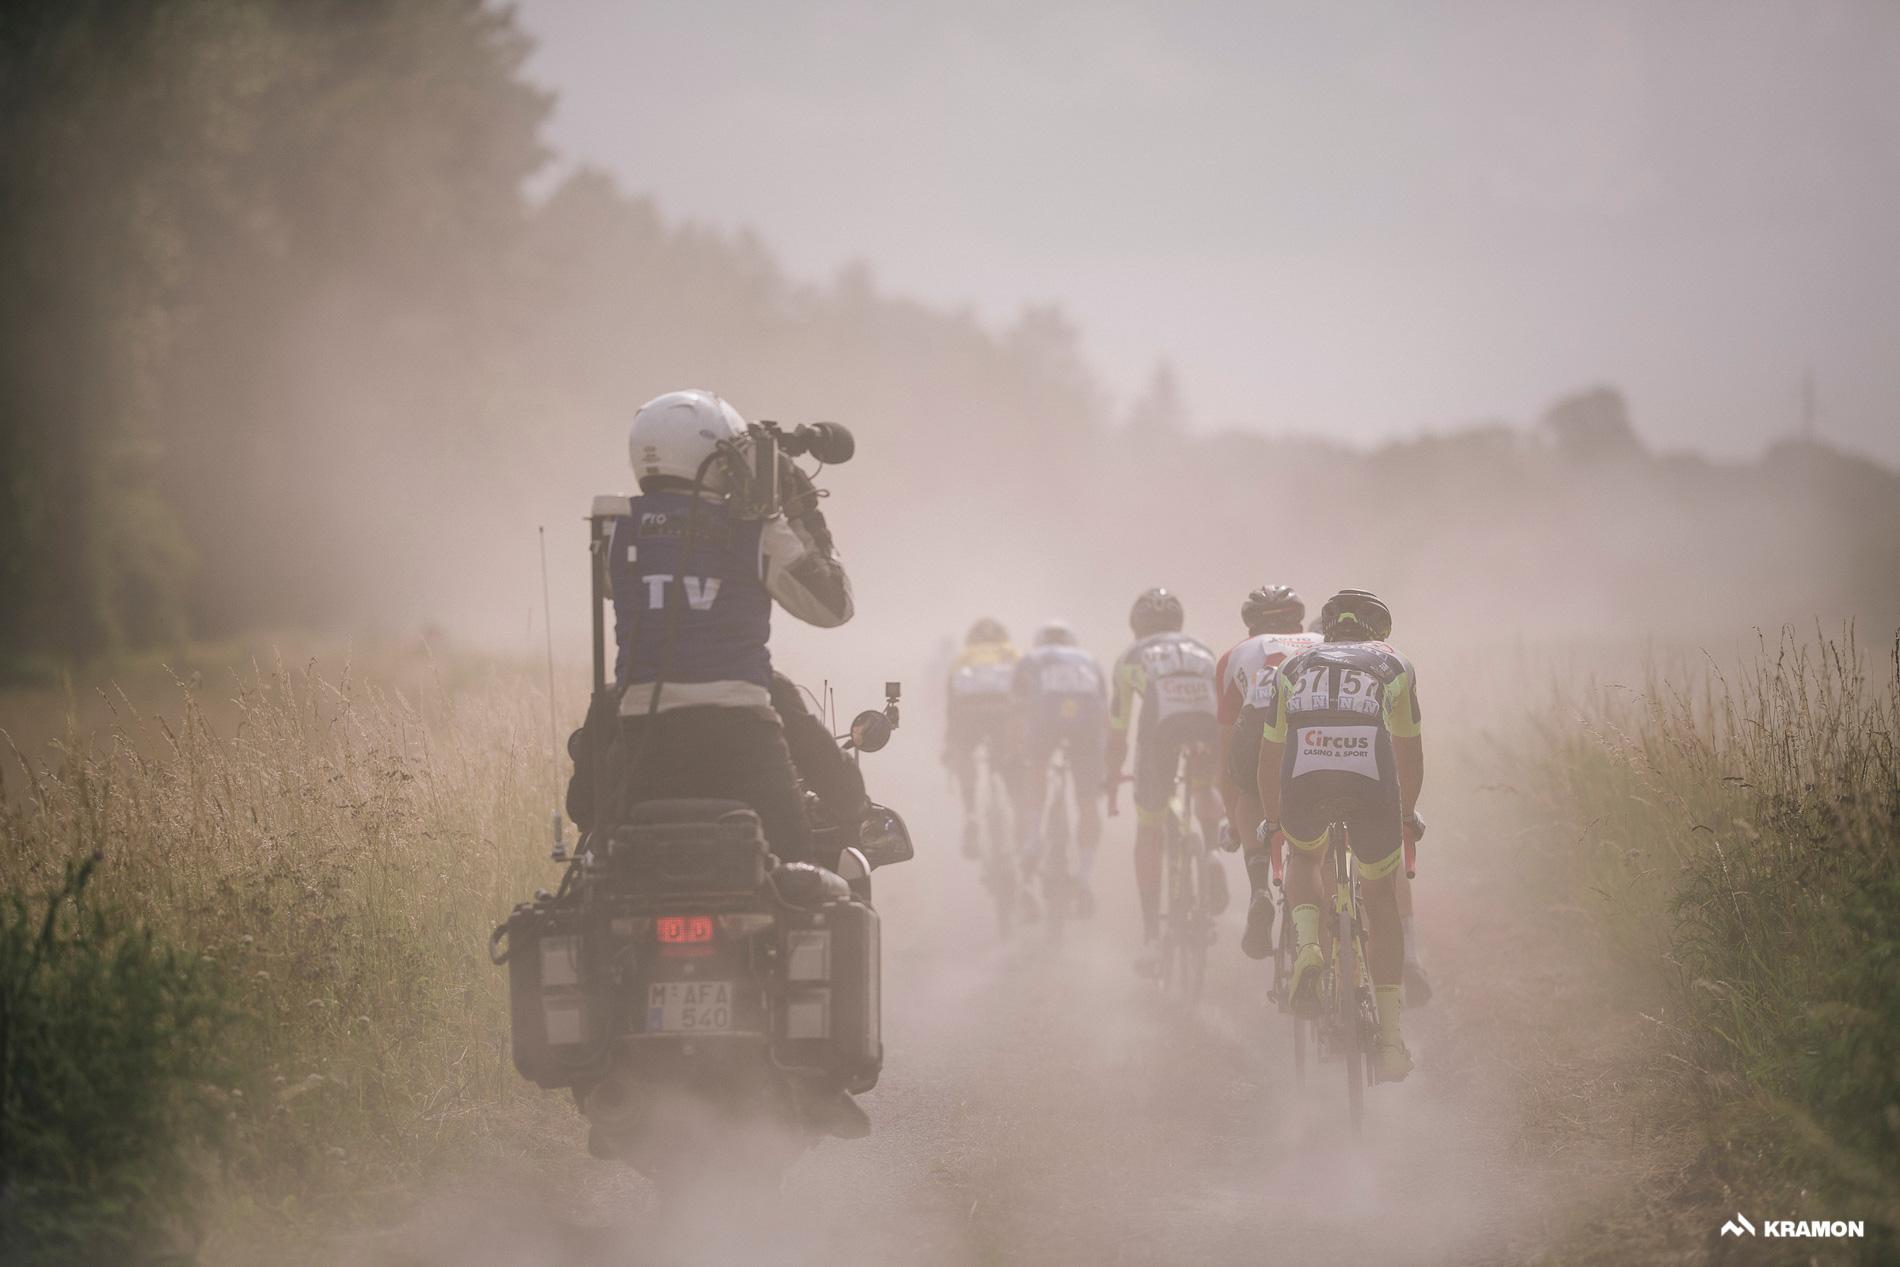 Sådan ser du pro-cykling i USA i 2021